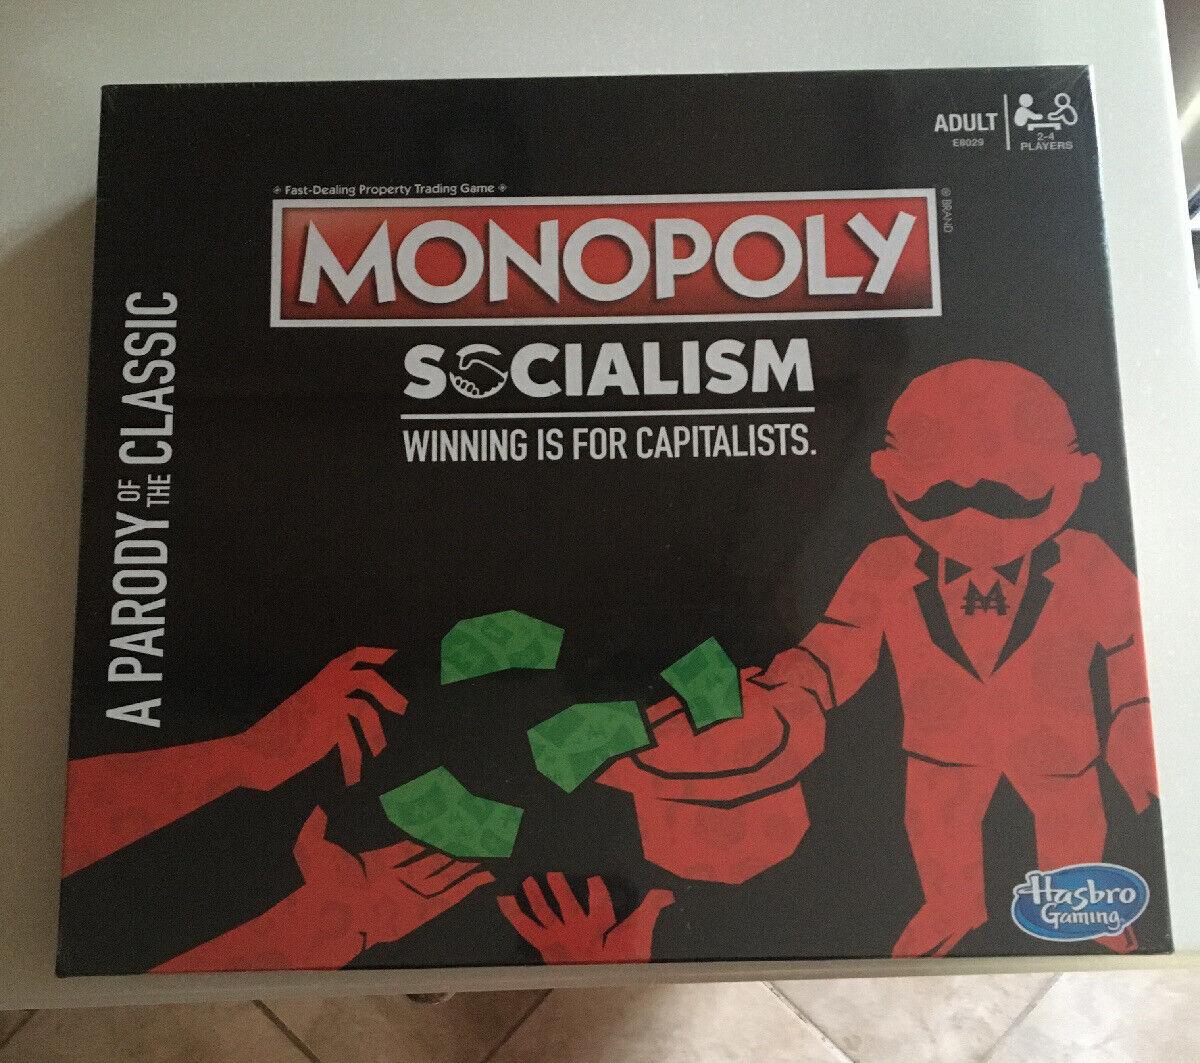 Jogo De Tabuleiro Monopoly Socialismo paródia capitalists Adulto Festa divertido Jogo Novo Lacrado